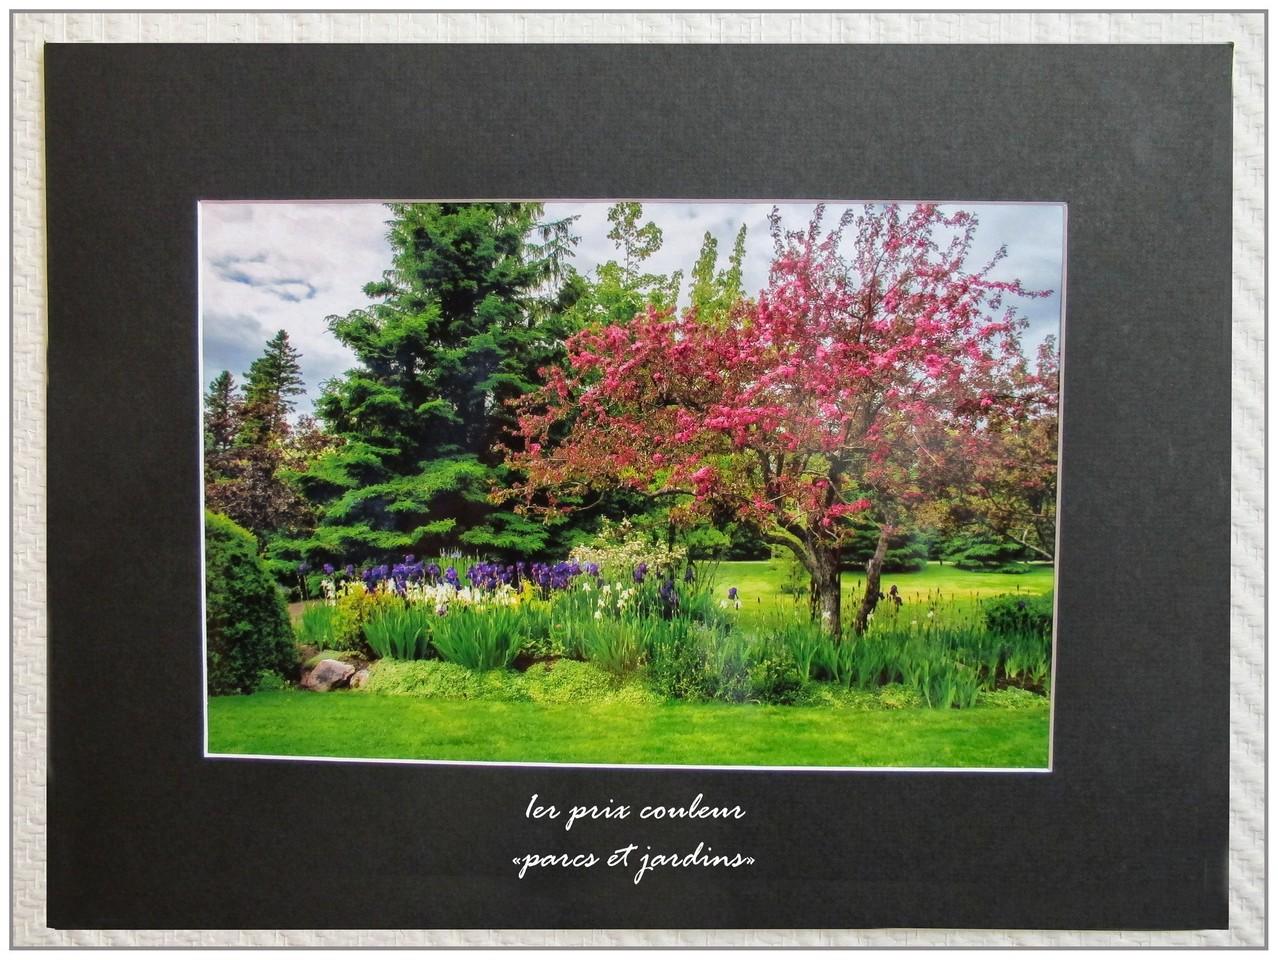 1er prix Parcs et jardins : Gilliane Coupel, Jardin de Métis